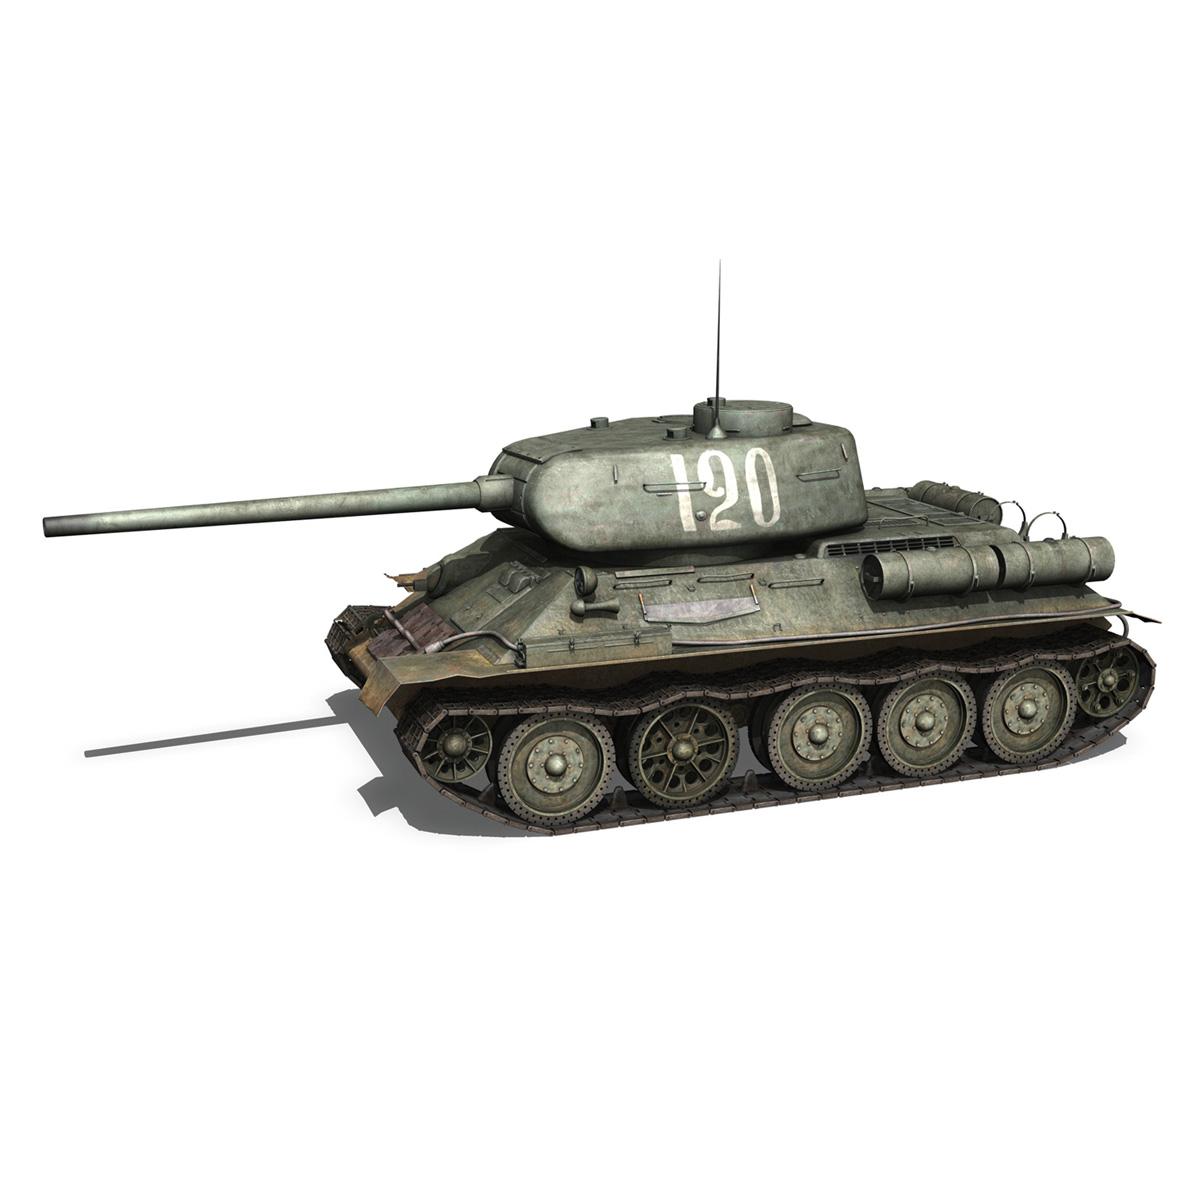 t-34 85 – soviet medium tank – 120 3d model 3ds fbx lwo lw lws obj c4d 265371